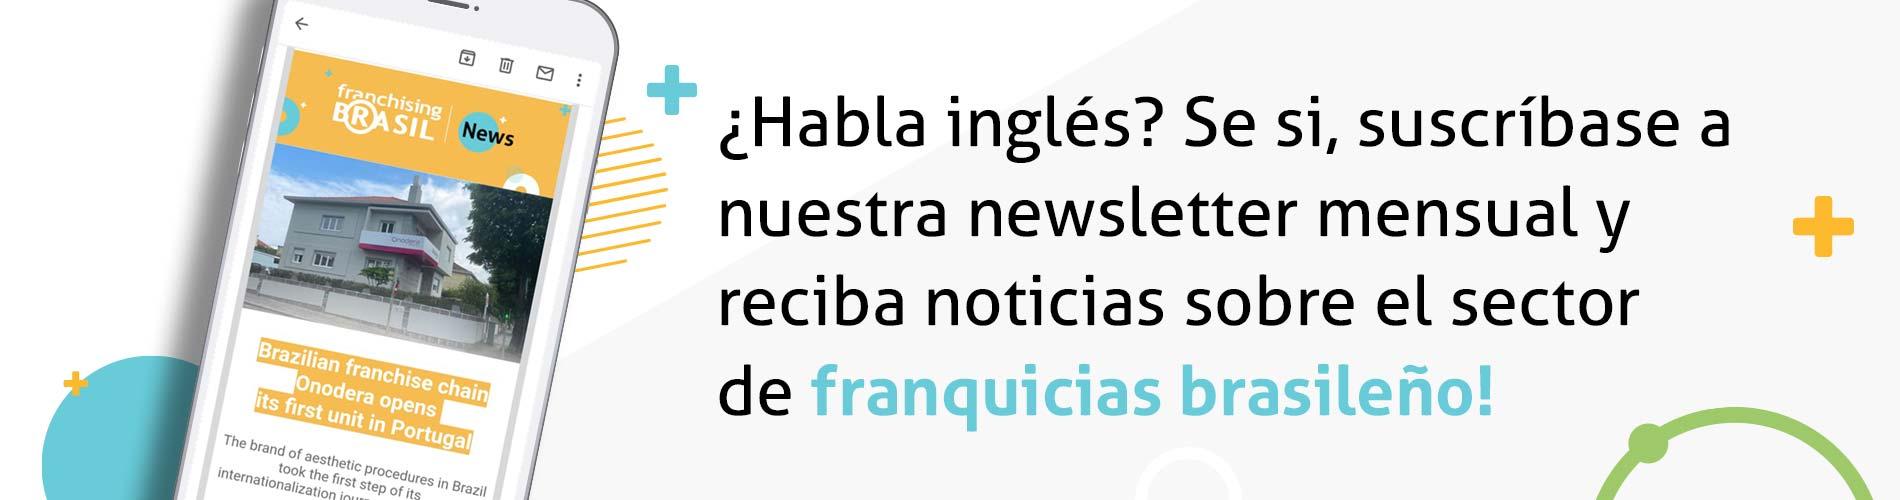 franchising-brasil-news-mensal-espanhol